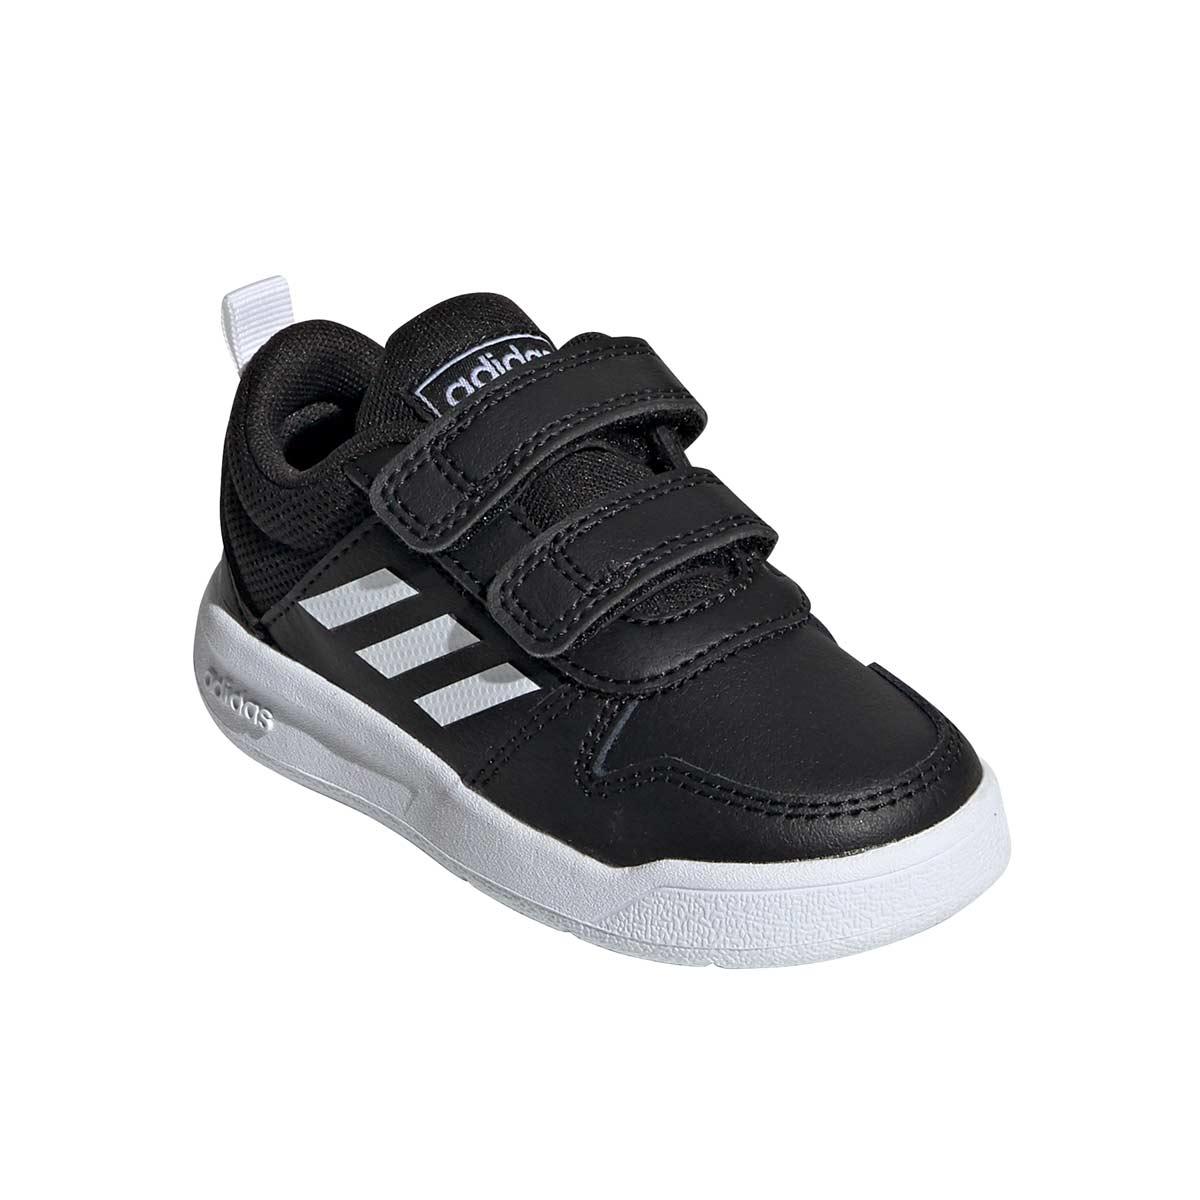 Tenis-Infantil-Adidas-Tensaurus-I--18-ao-25--